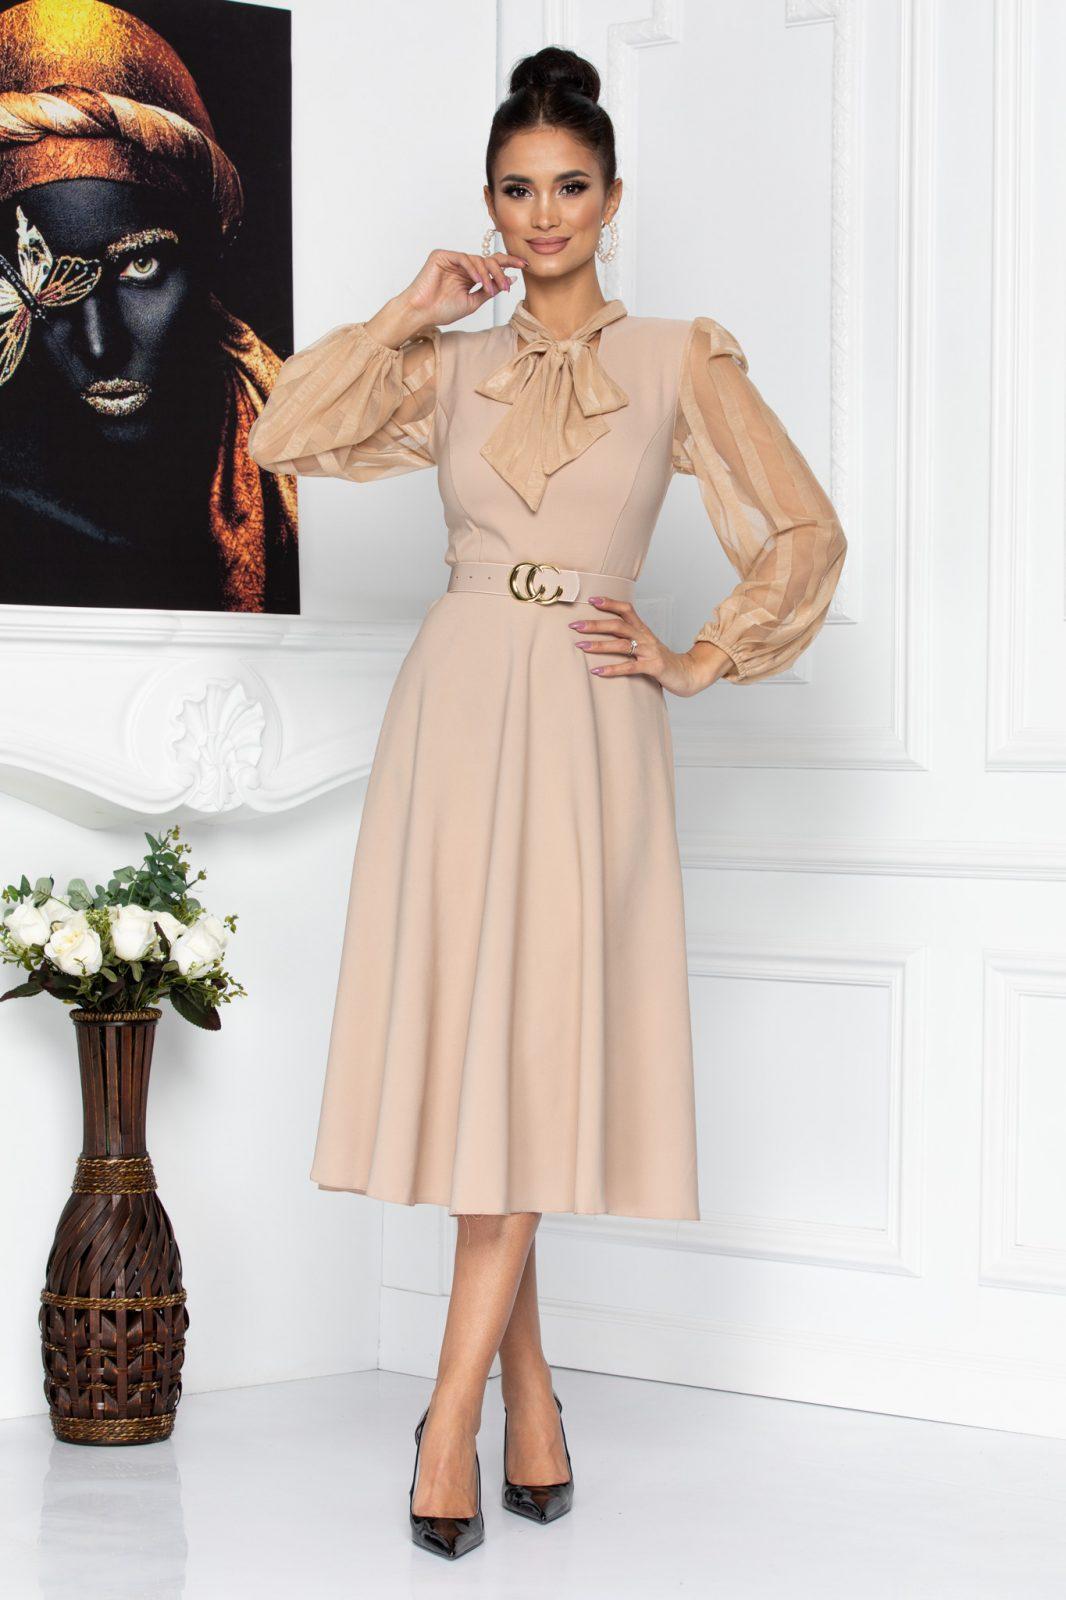 Nude Βραδινό Φόρεμα Με Ζώνη Nima 8670